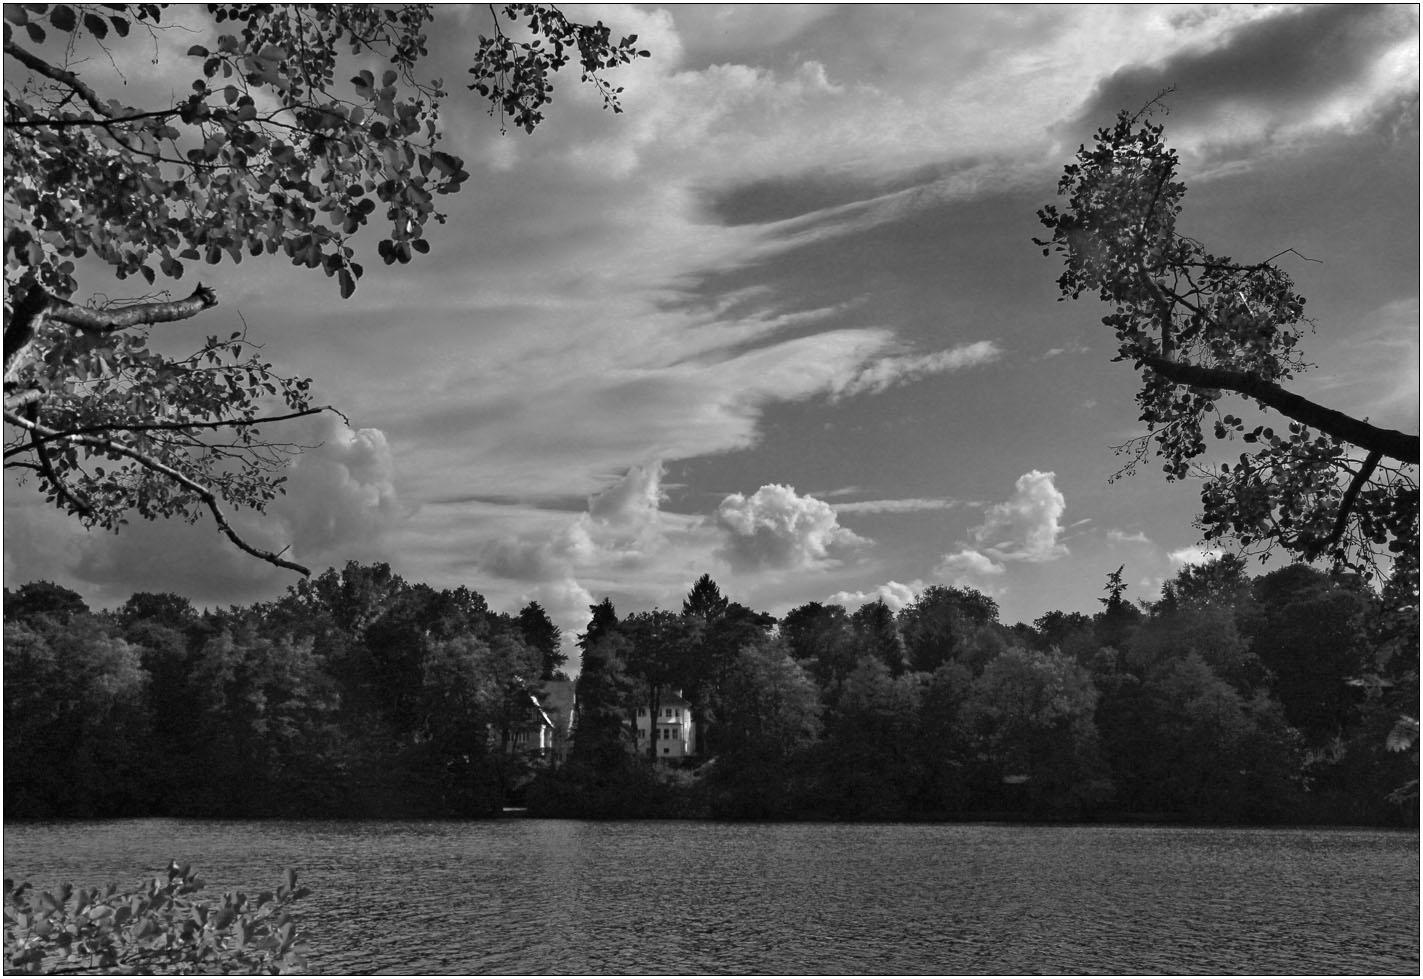 Septemberwolken ...